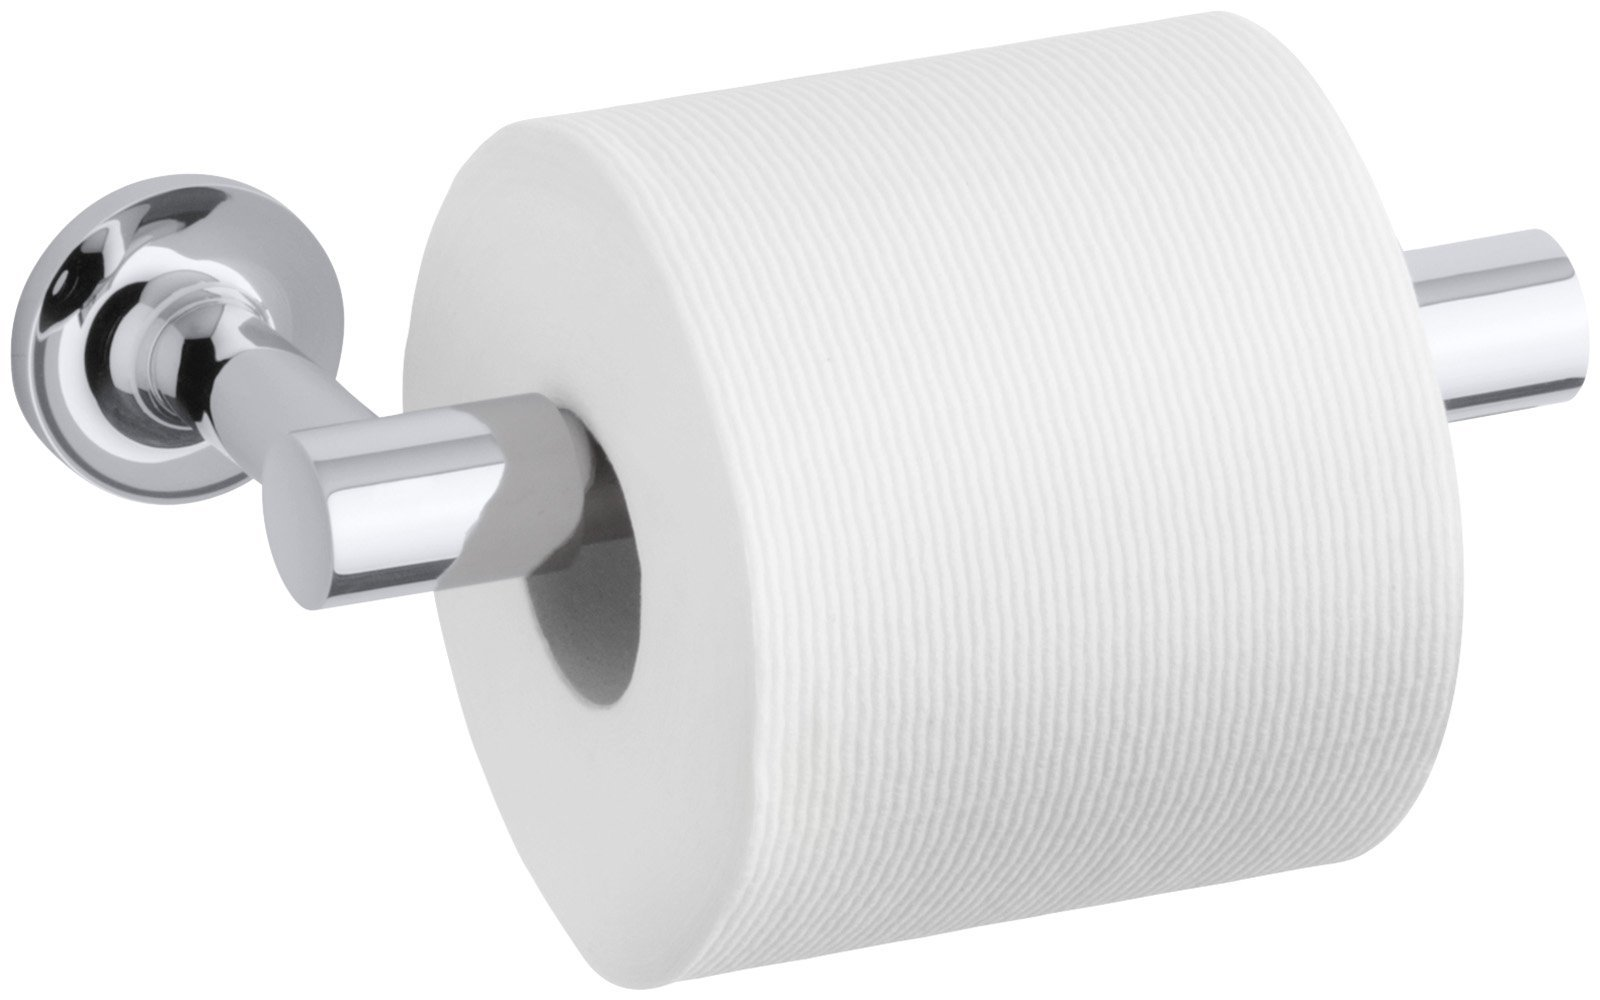 Kohler K-14377-Cp Purist Pivoting Toilet Tissue Holder, Polished Chrome